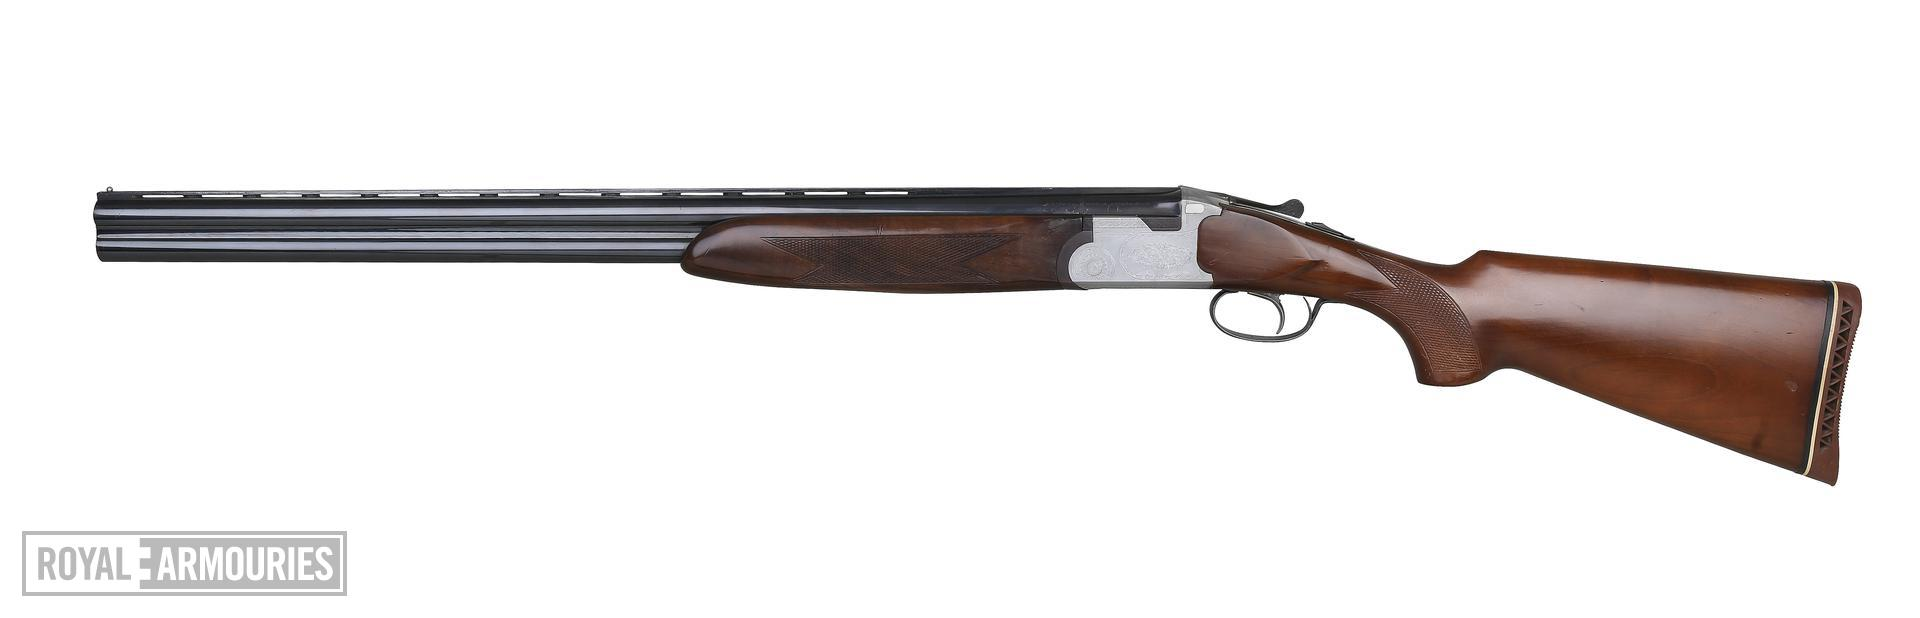 Centrefire breech-loading double-barrelled shotgun By Arizaga. (XII.7159)